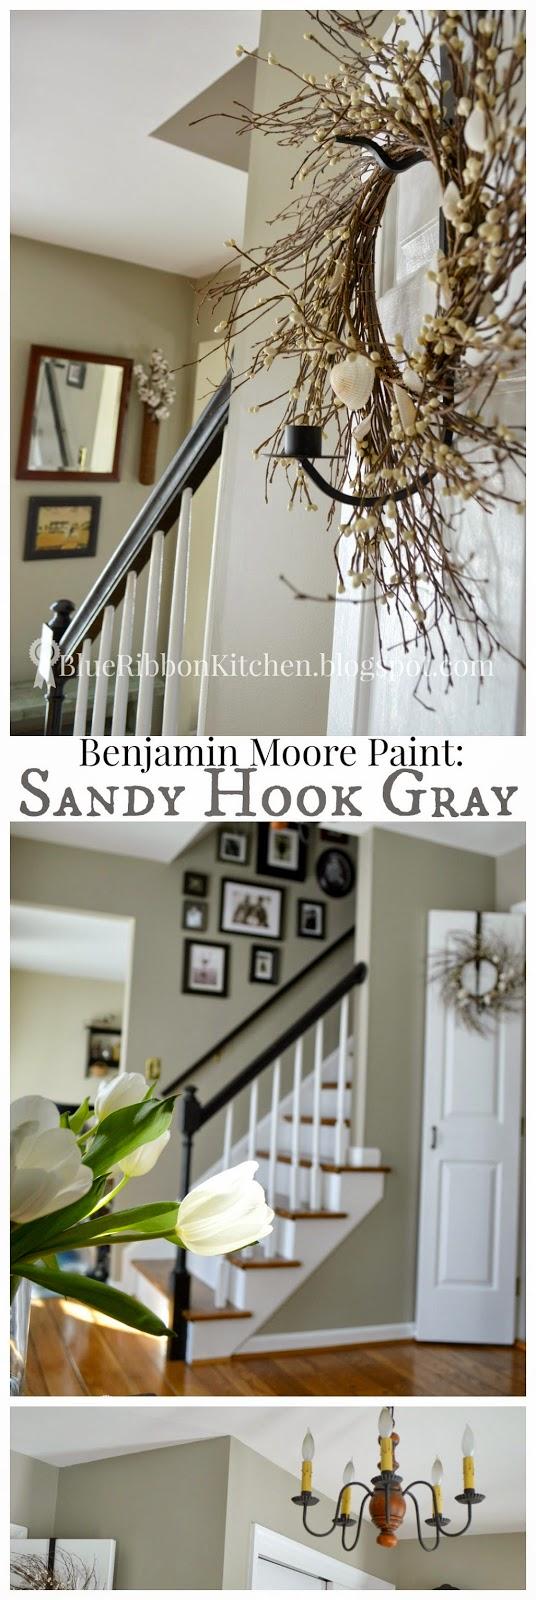 Sandy Hook Gray Benjamin Moore